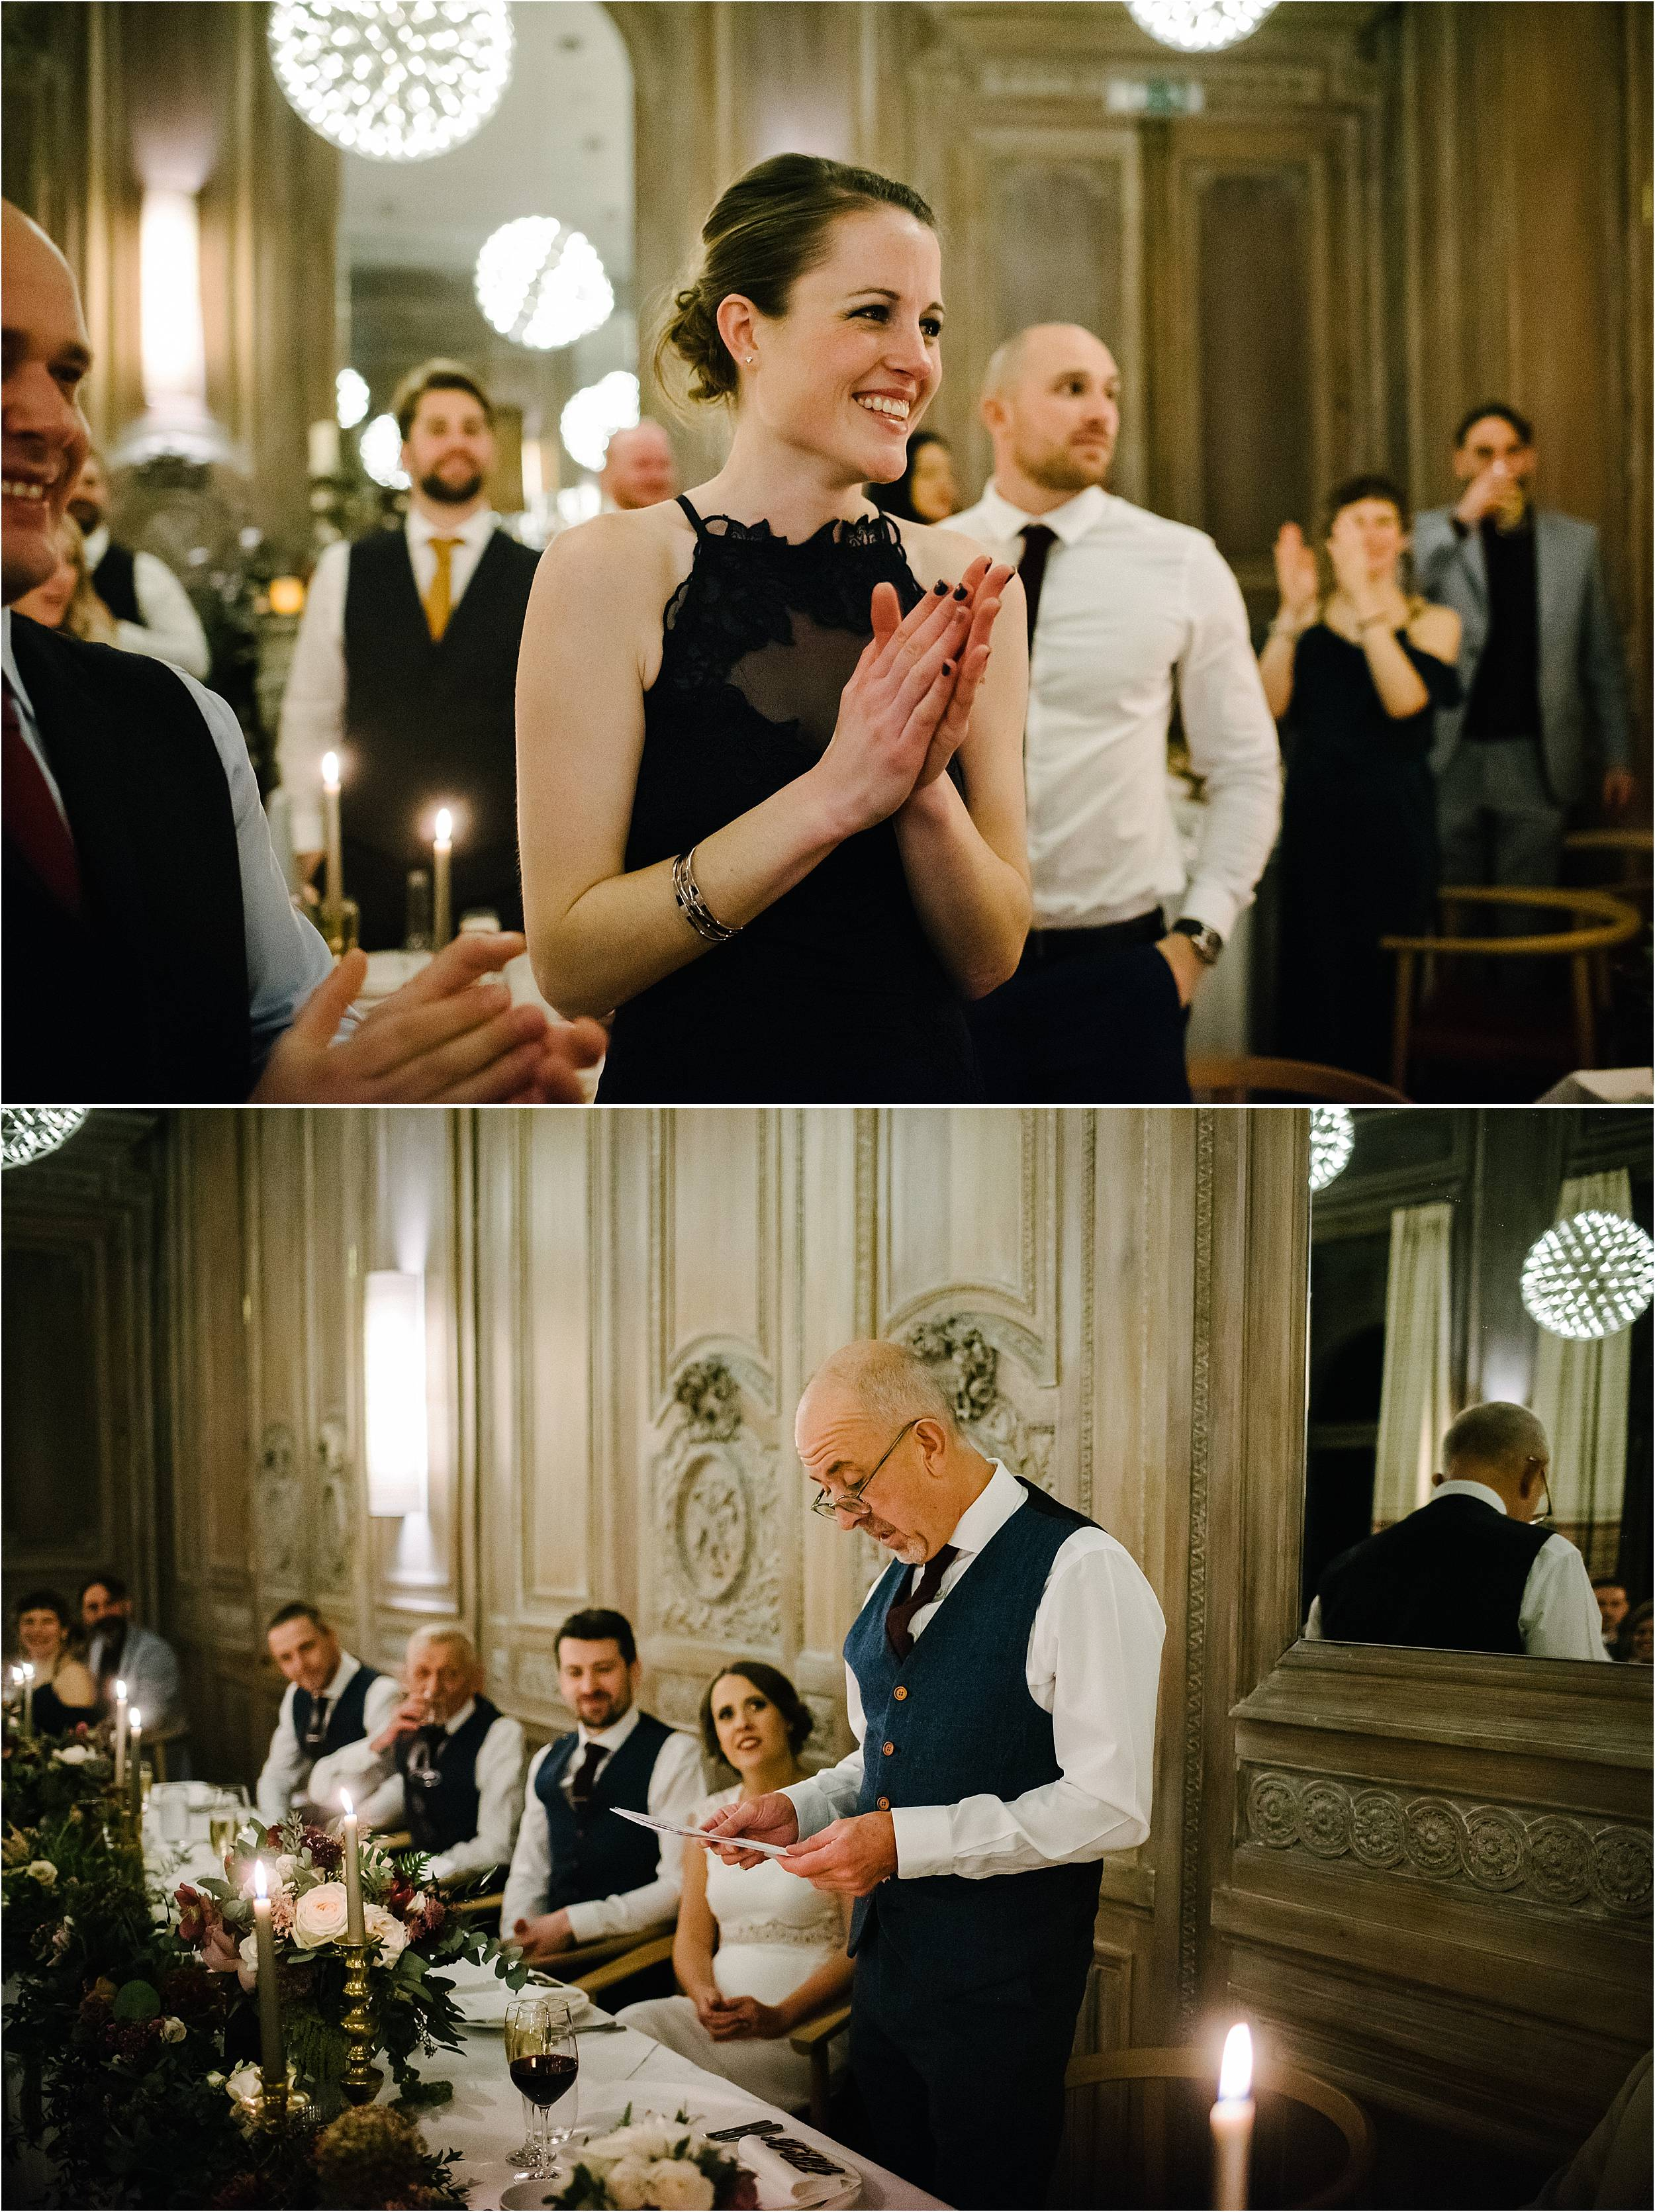 Cowley Manor Cotswolds Wedding Photographer_0101.jpg